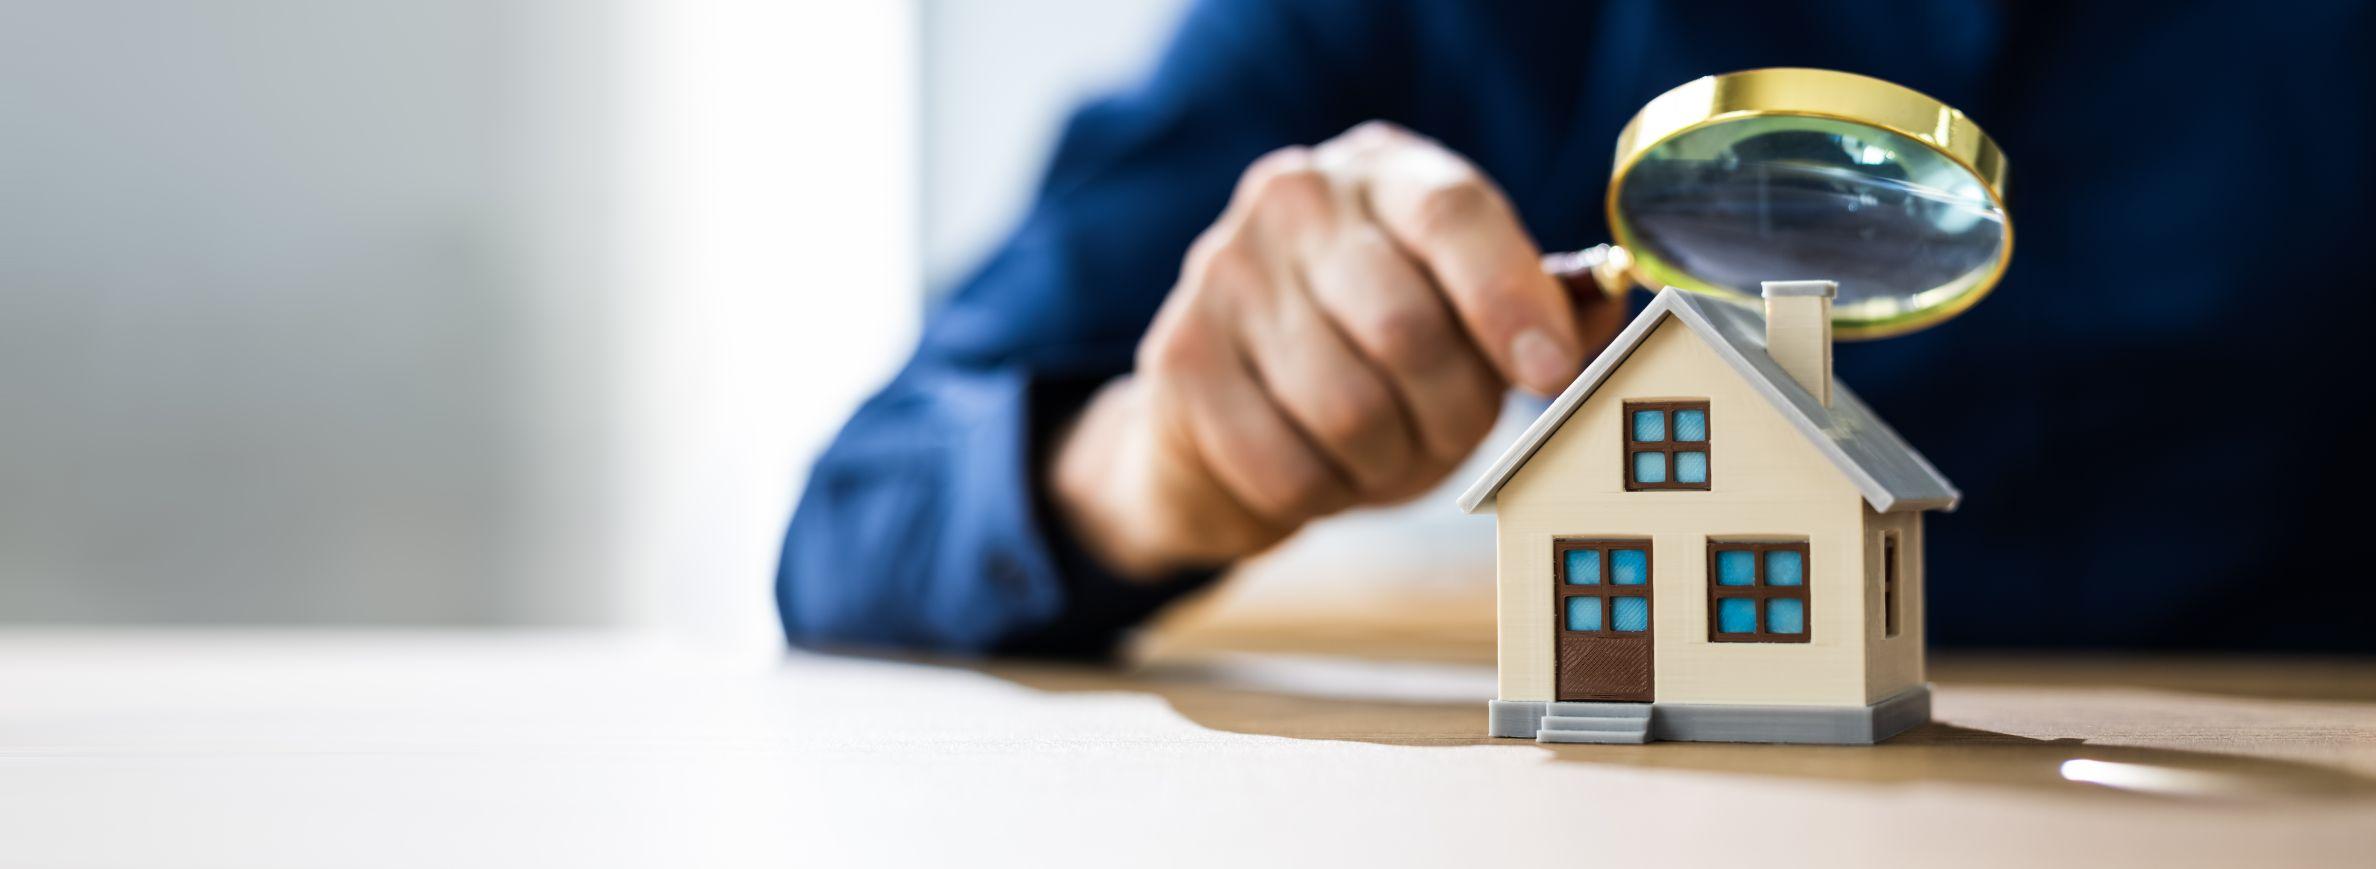 assurance habitation chateauguay prix